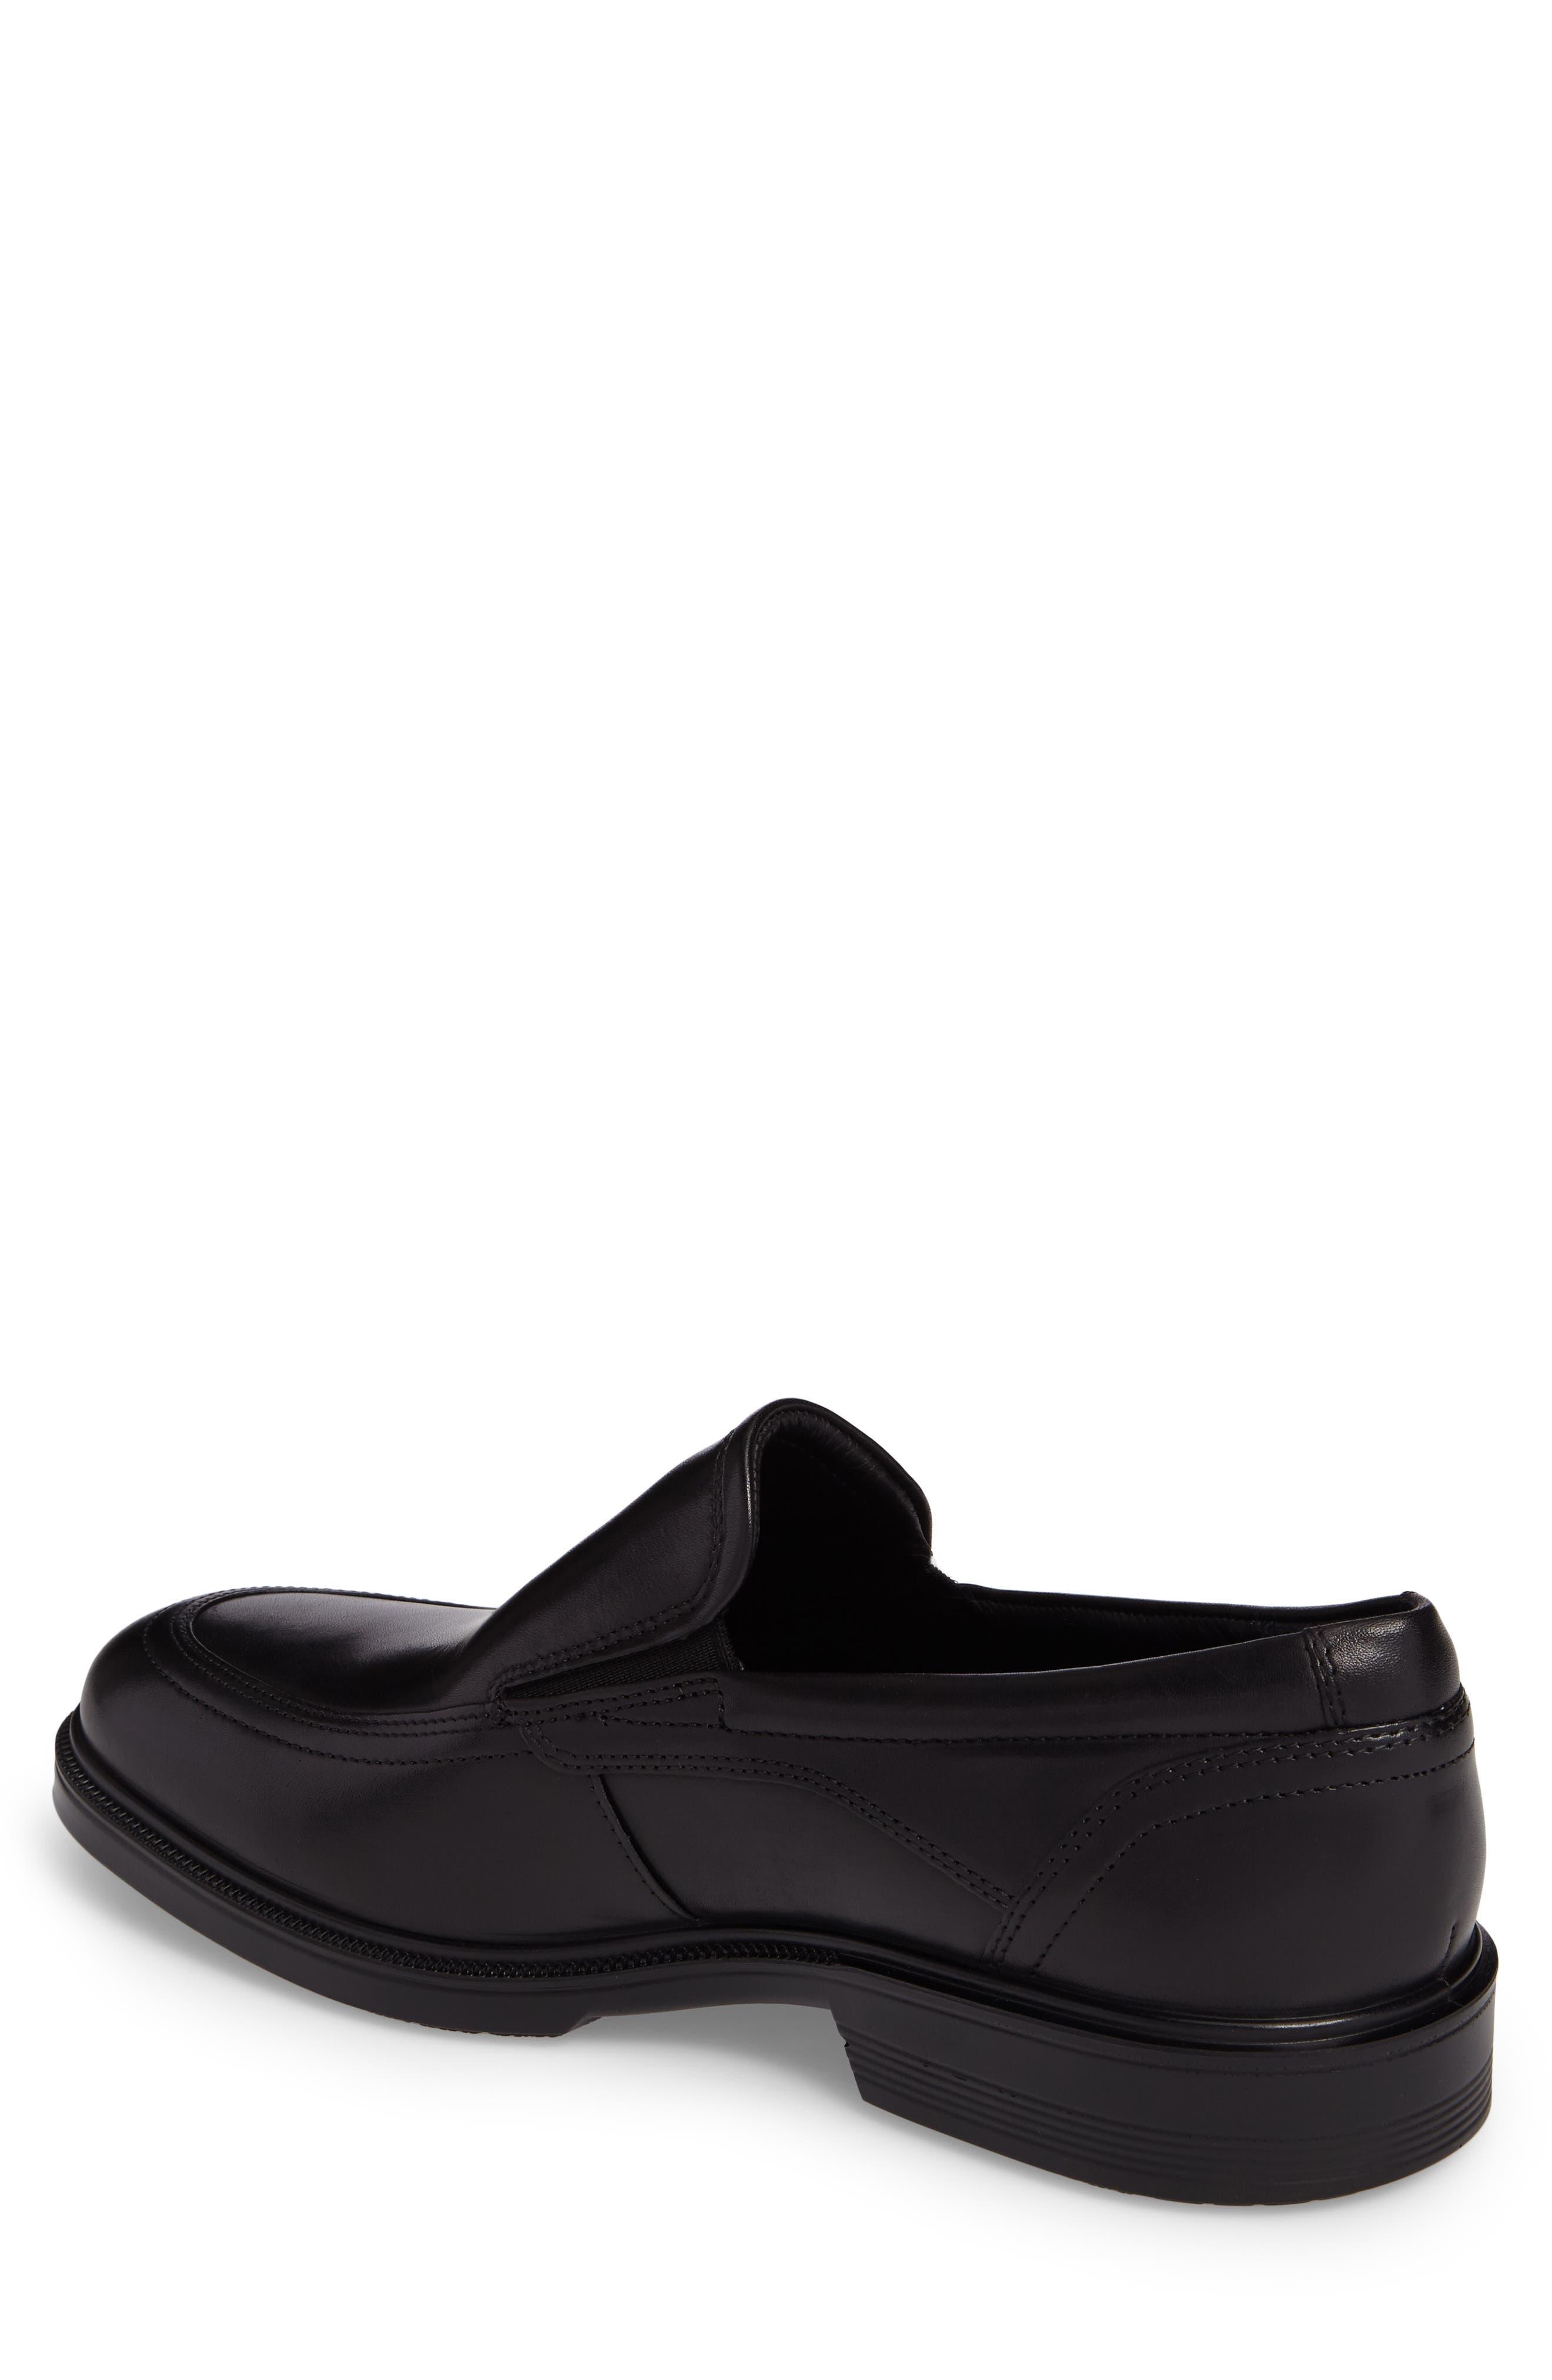 Lisbon Loafer,                             Alternate thumbnail 2, color,                             BLACK LEATHER